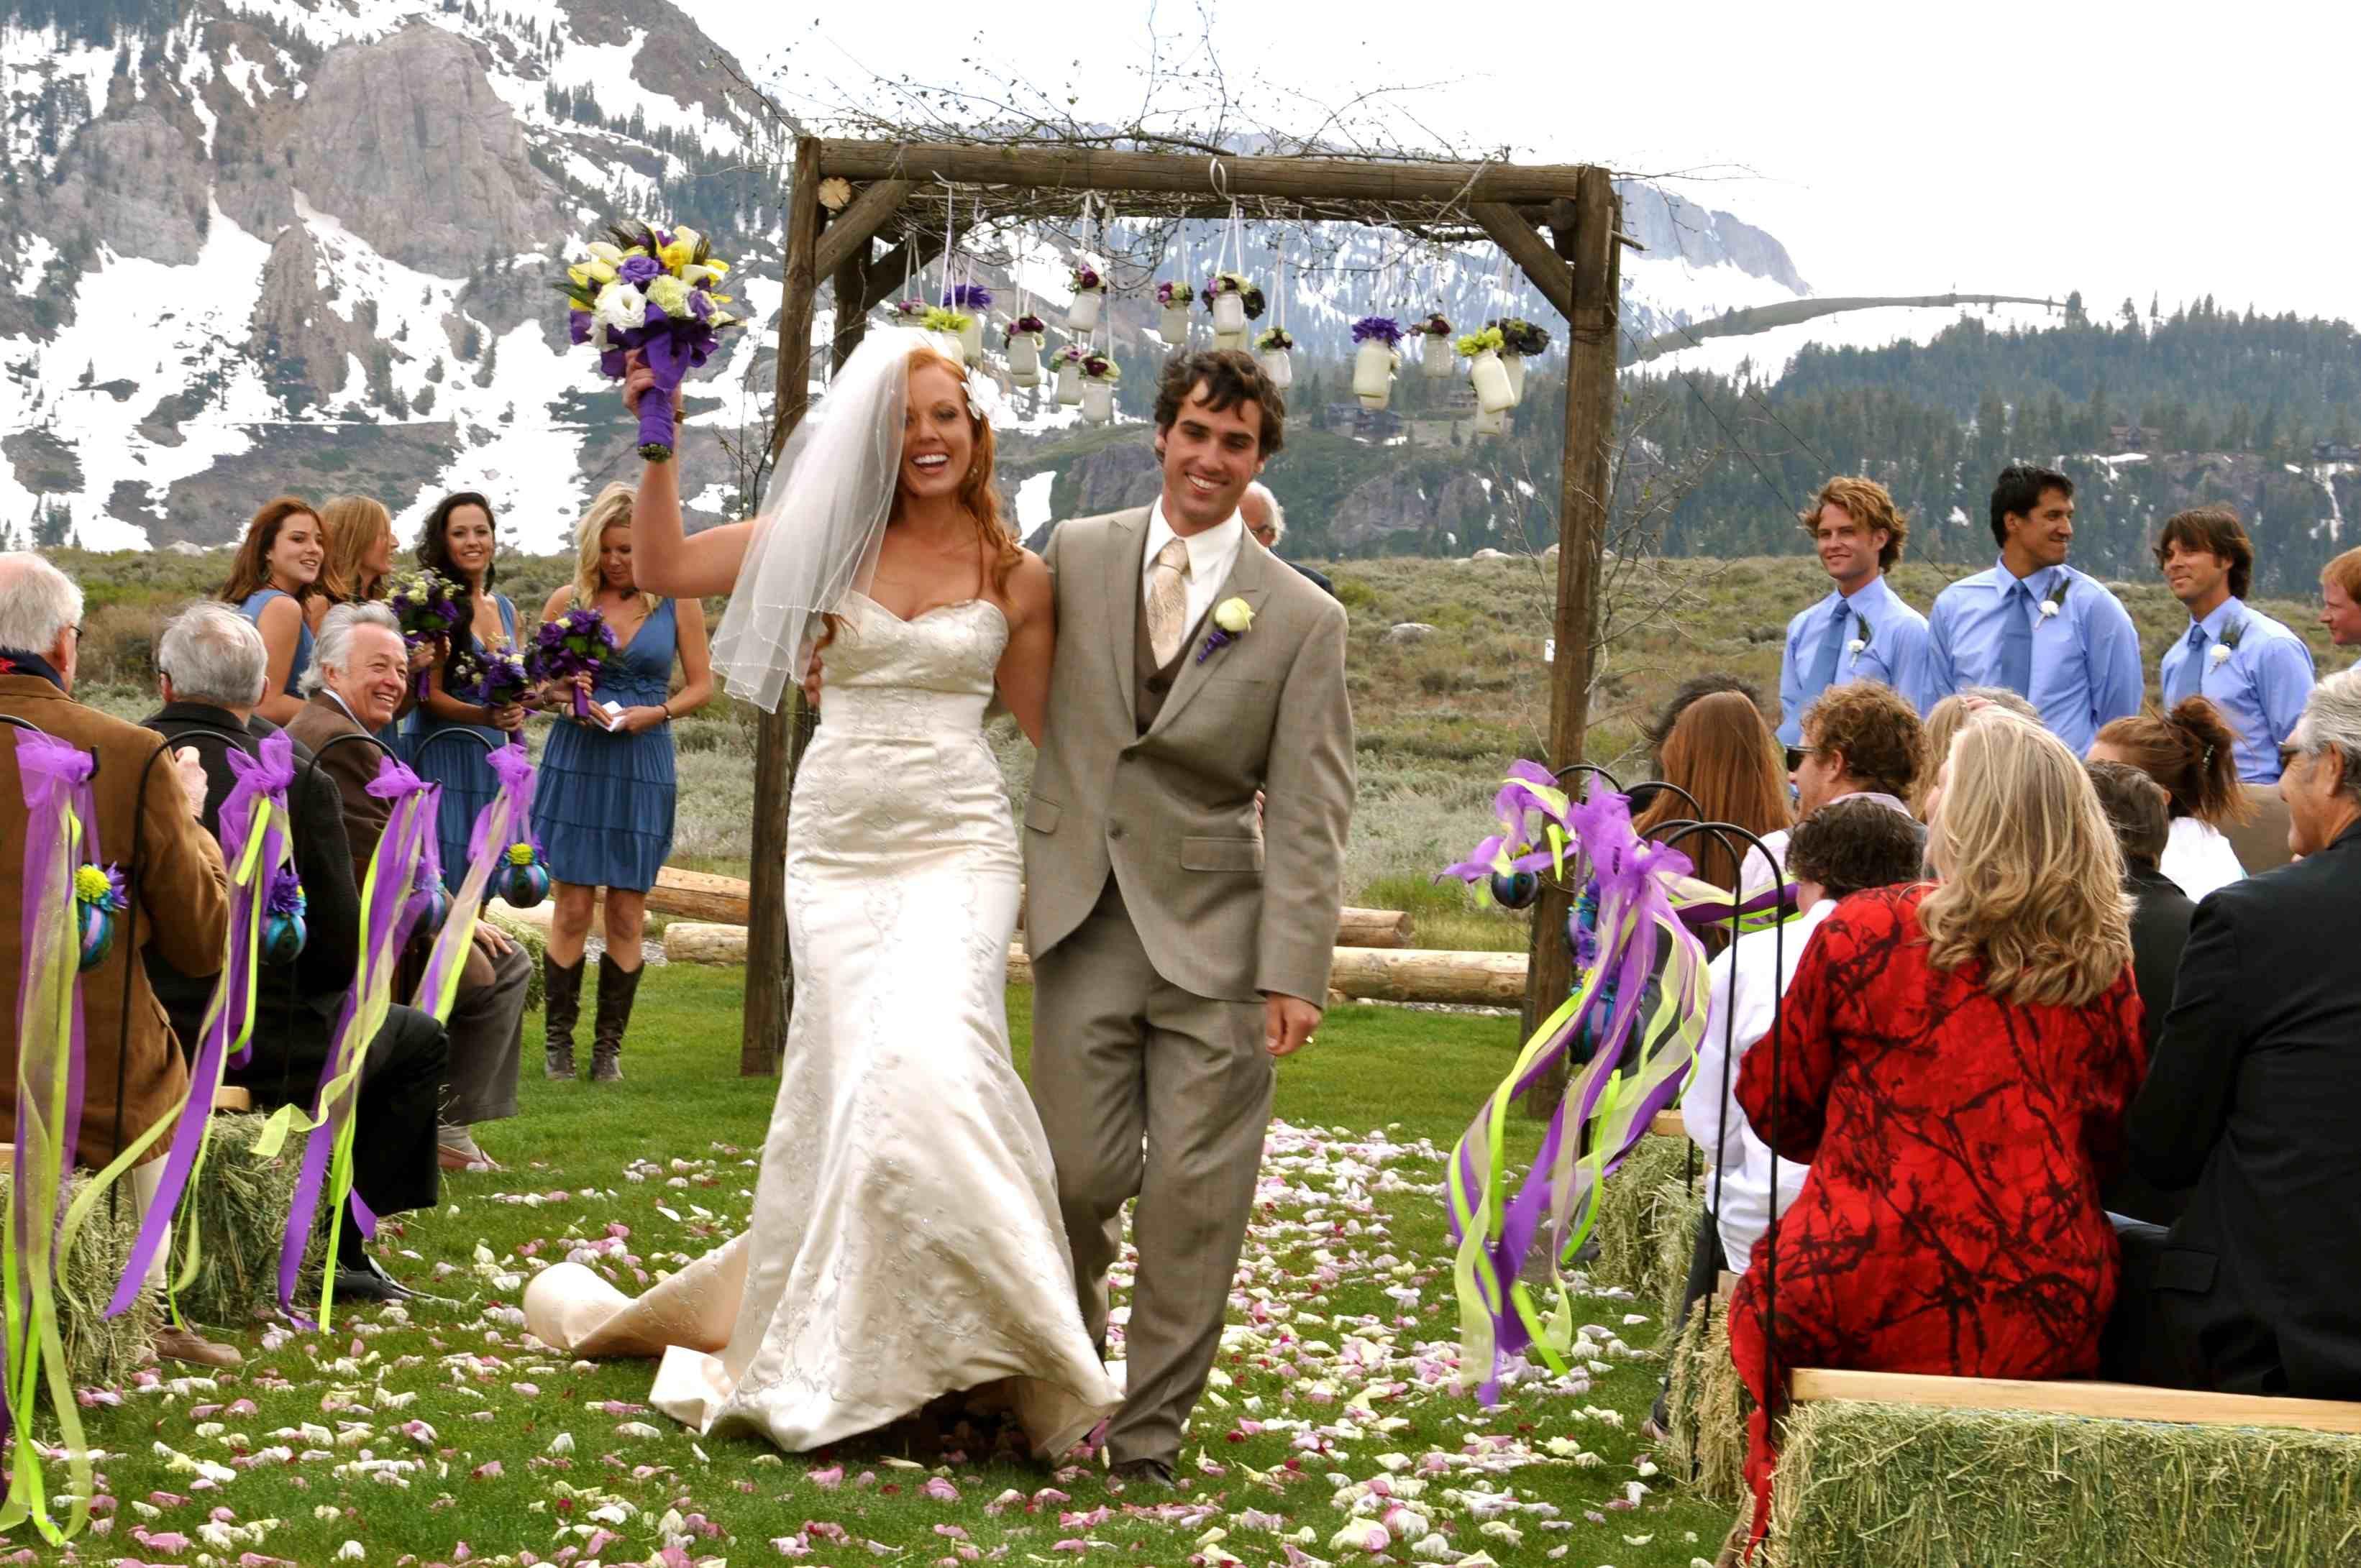 Wedding Outdoor Attire For Grooms